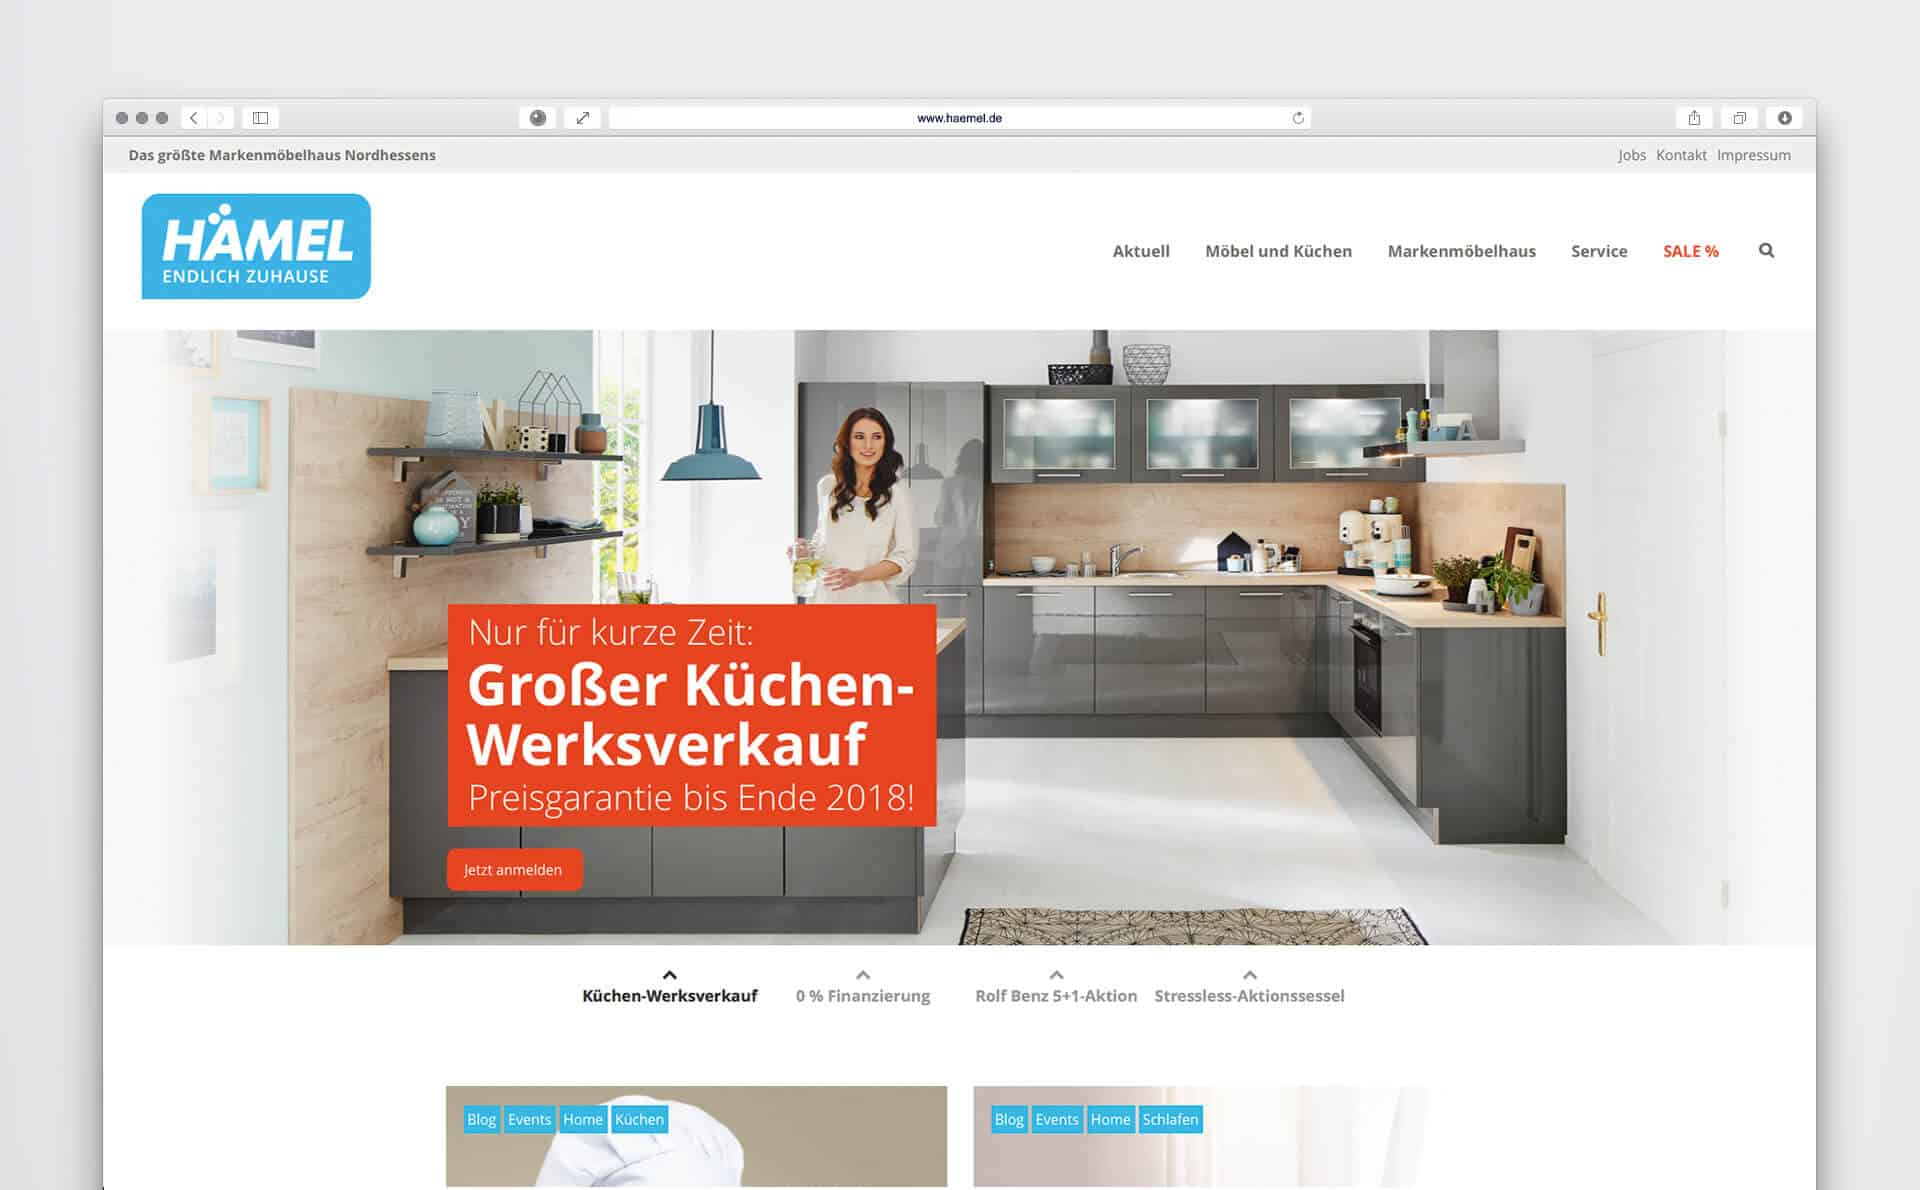 Gerryland-Referenz-Hämel-Website-Screens-4 klassische-werbung-referenz